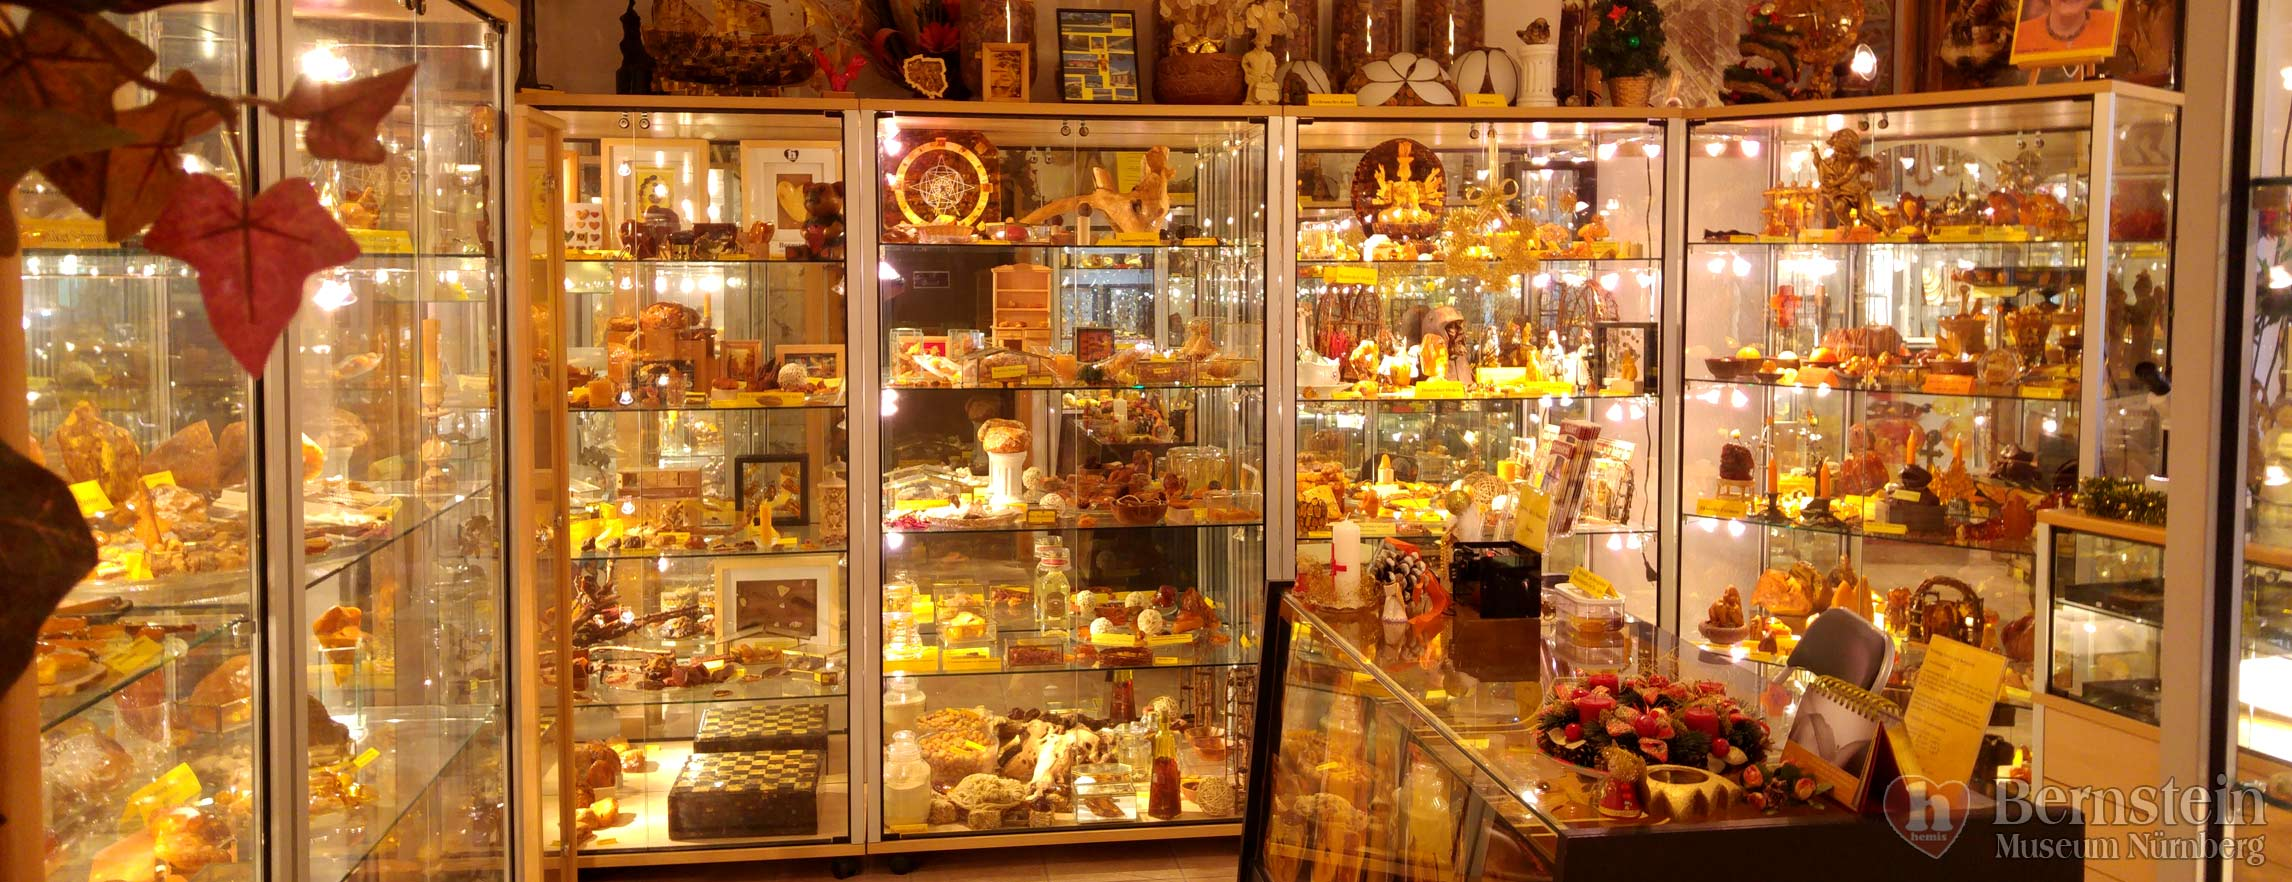 Amber shop Nuremberg